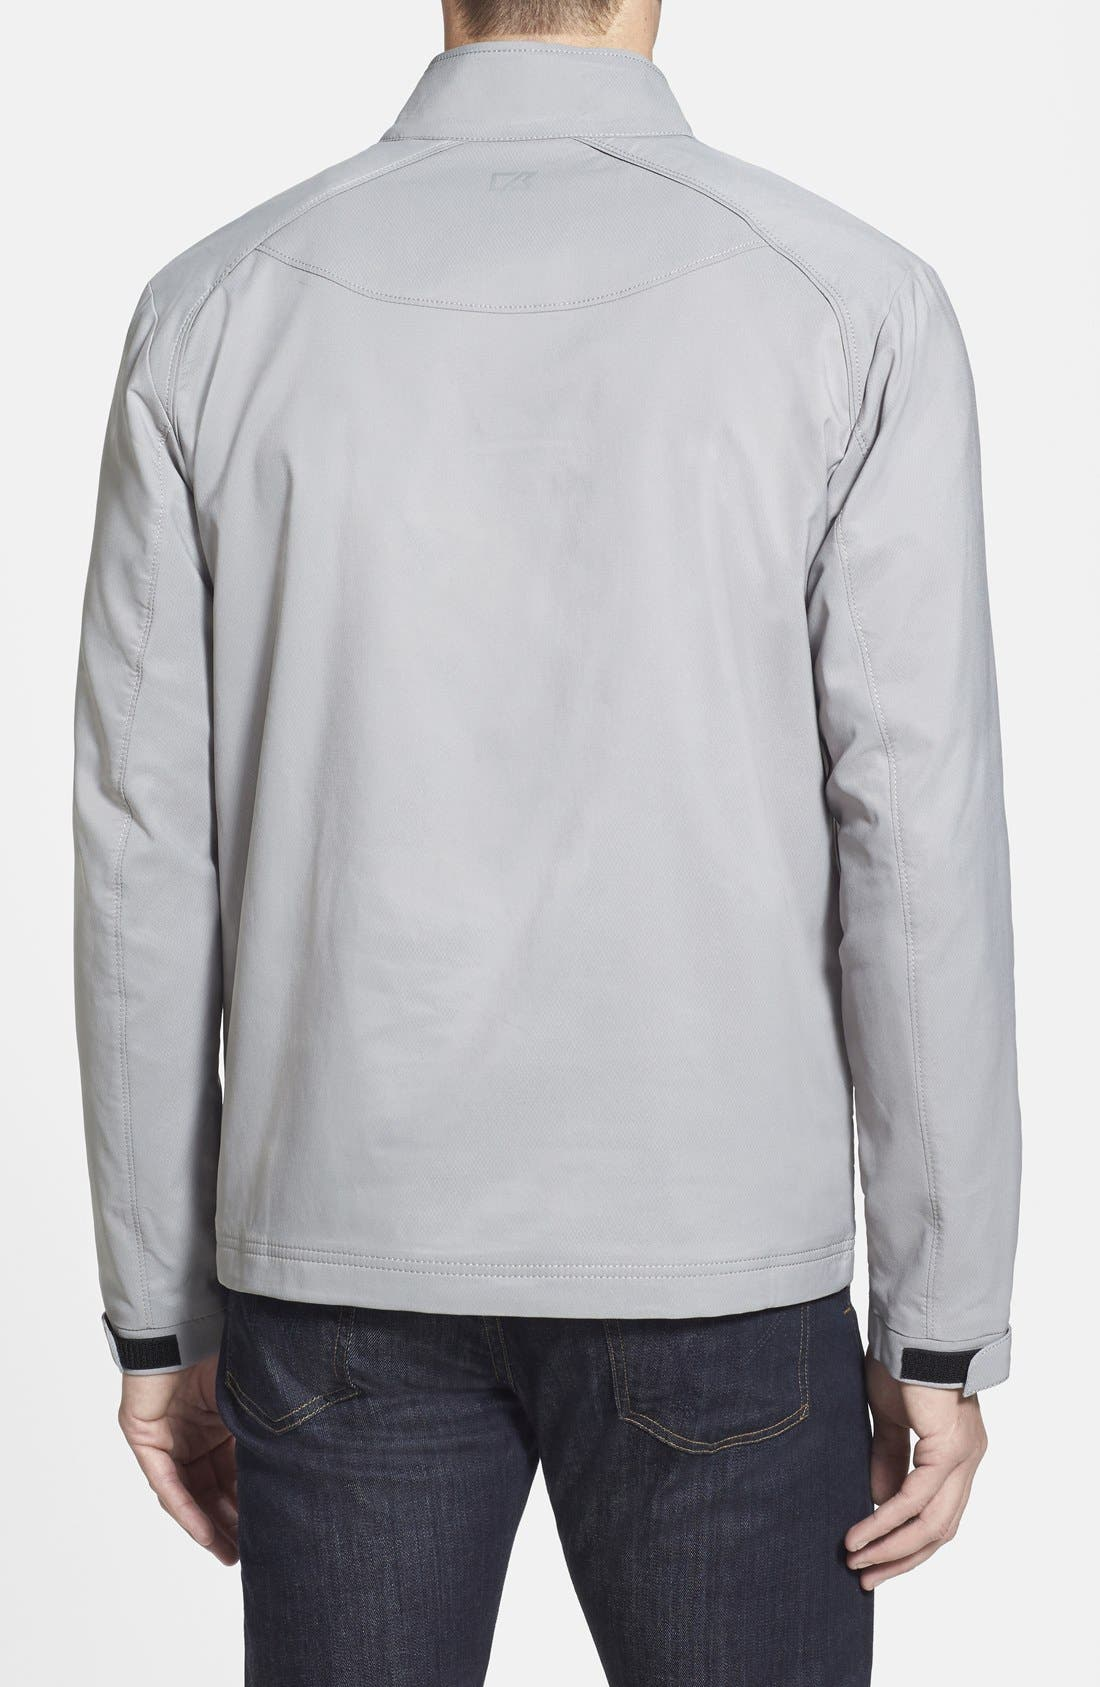 CUTTER & BUCK, Blakely WeatherTec<sup>®</sup> Wind & Water Resistant Full Zip Jacket, Alternate thumbnail 2, color, OXIDE GREY